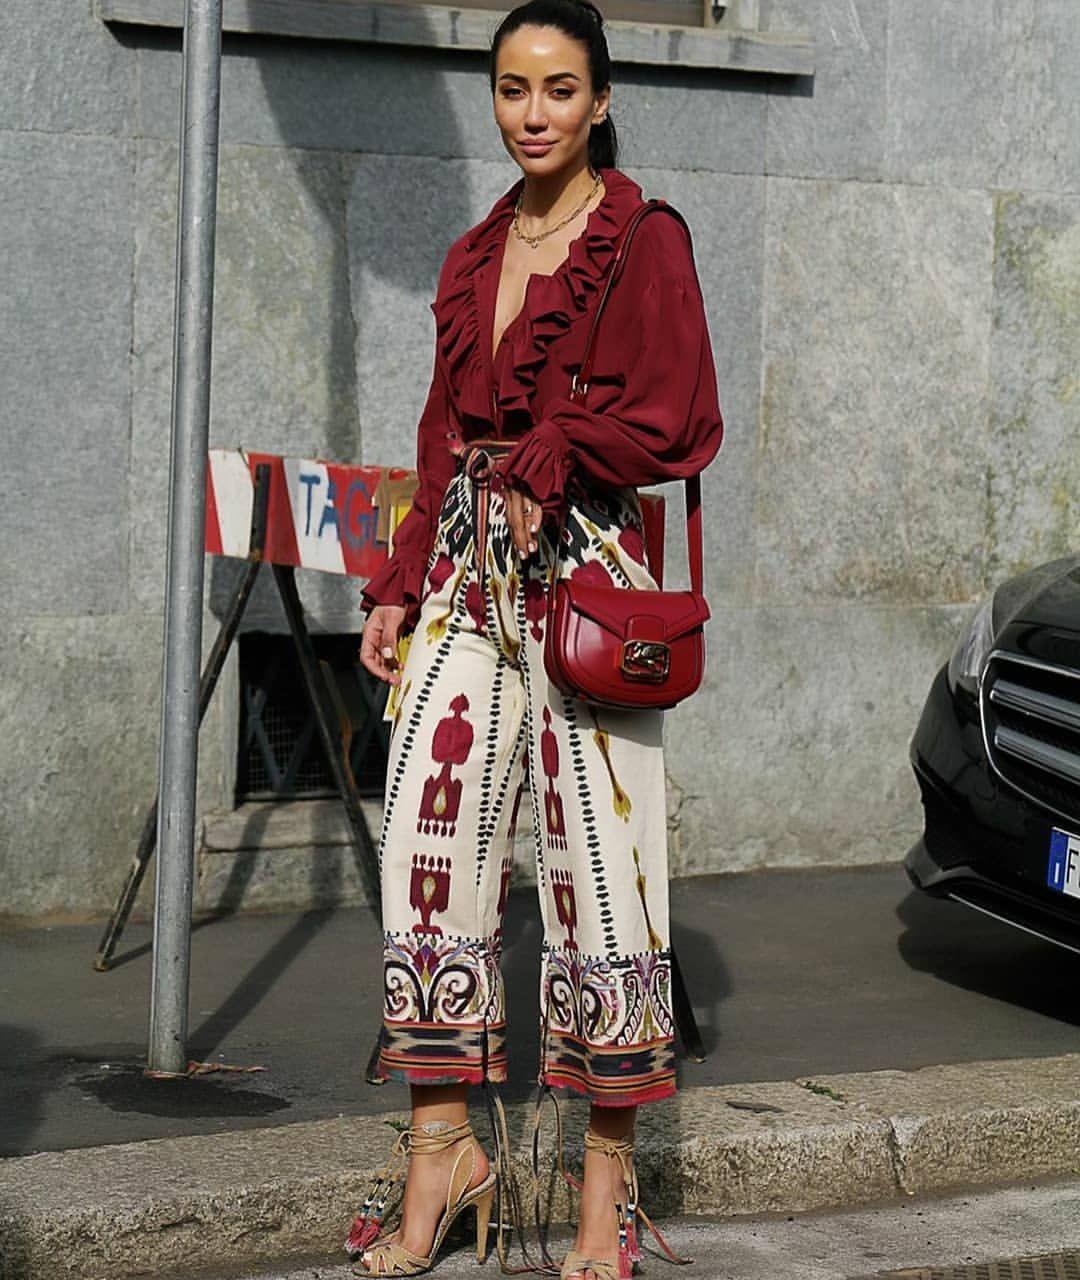 Details™ ⭐ #details #streetstyle #streetfashion #fashion #style #fashionstyle #trend #ootd #runway #fashionshow #glam #fashionworld…